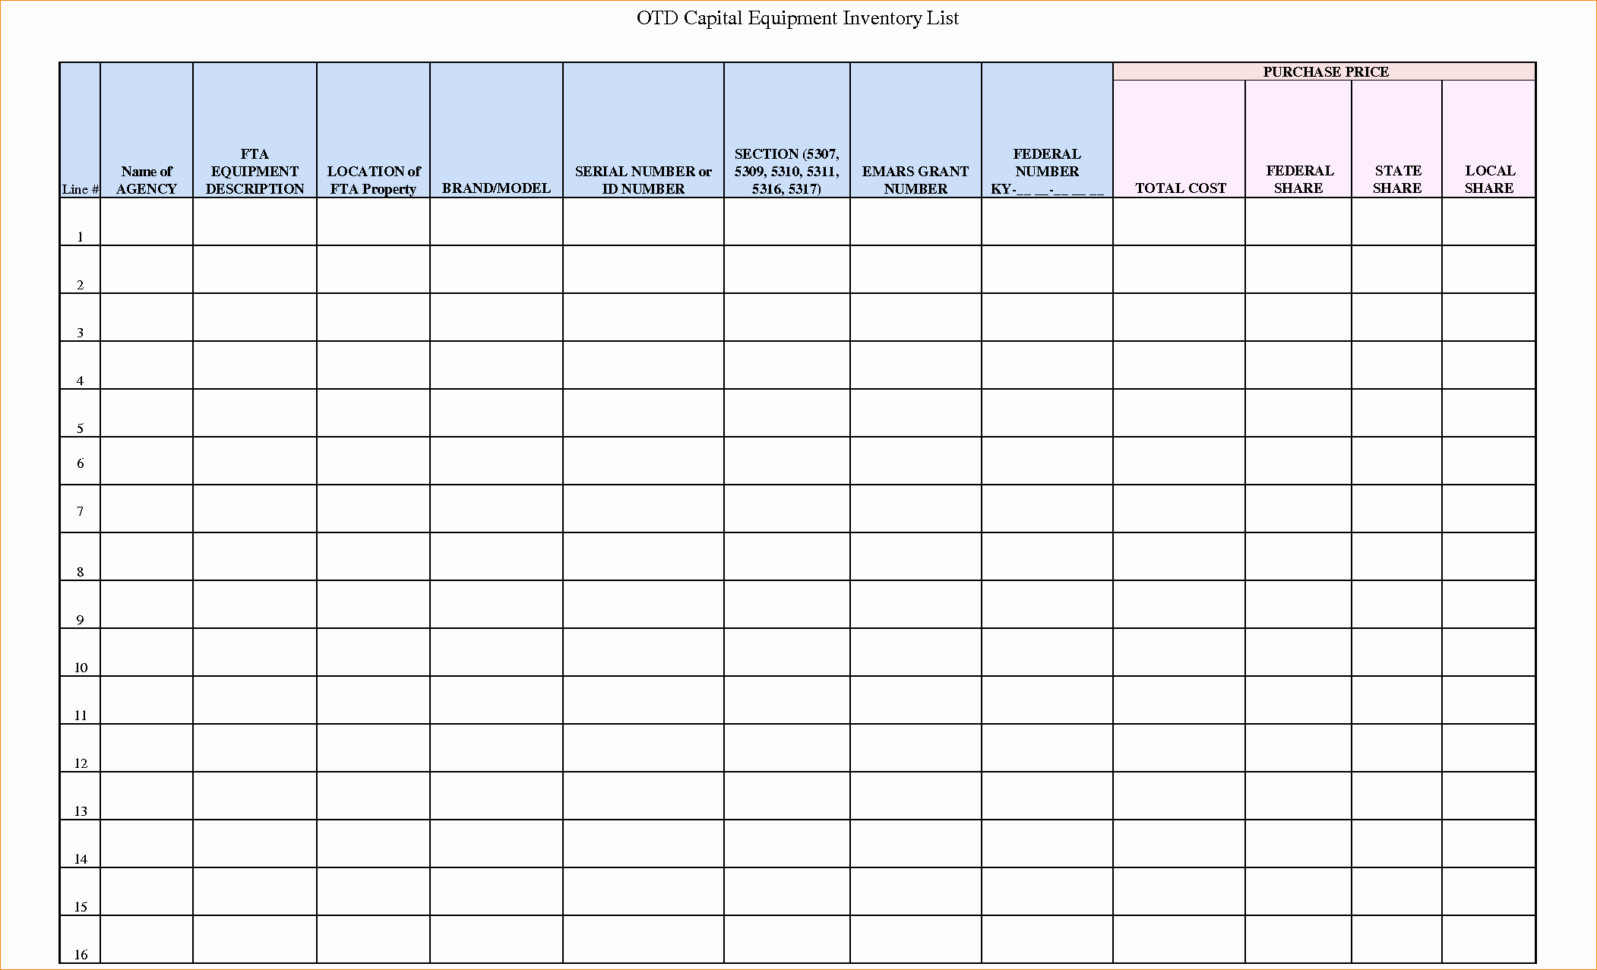 Beer Inventory Spreadsheet Beautiful Beer Inventory Spreadsheet Free With Free Bar Inventory Spreadsheet